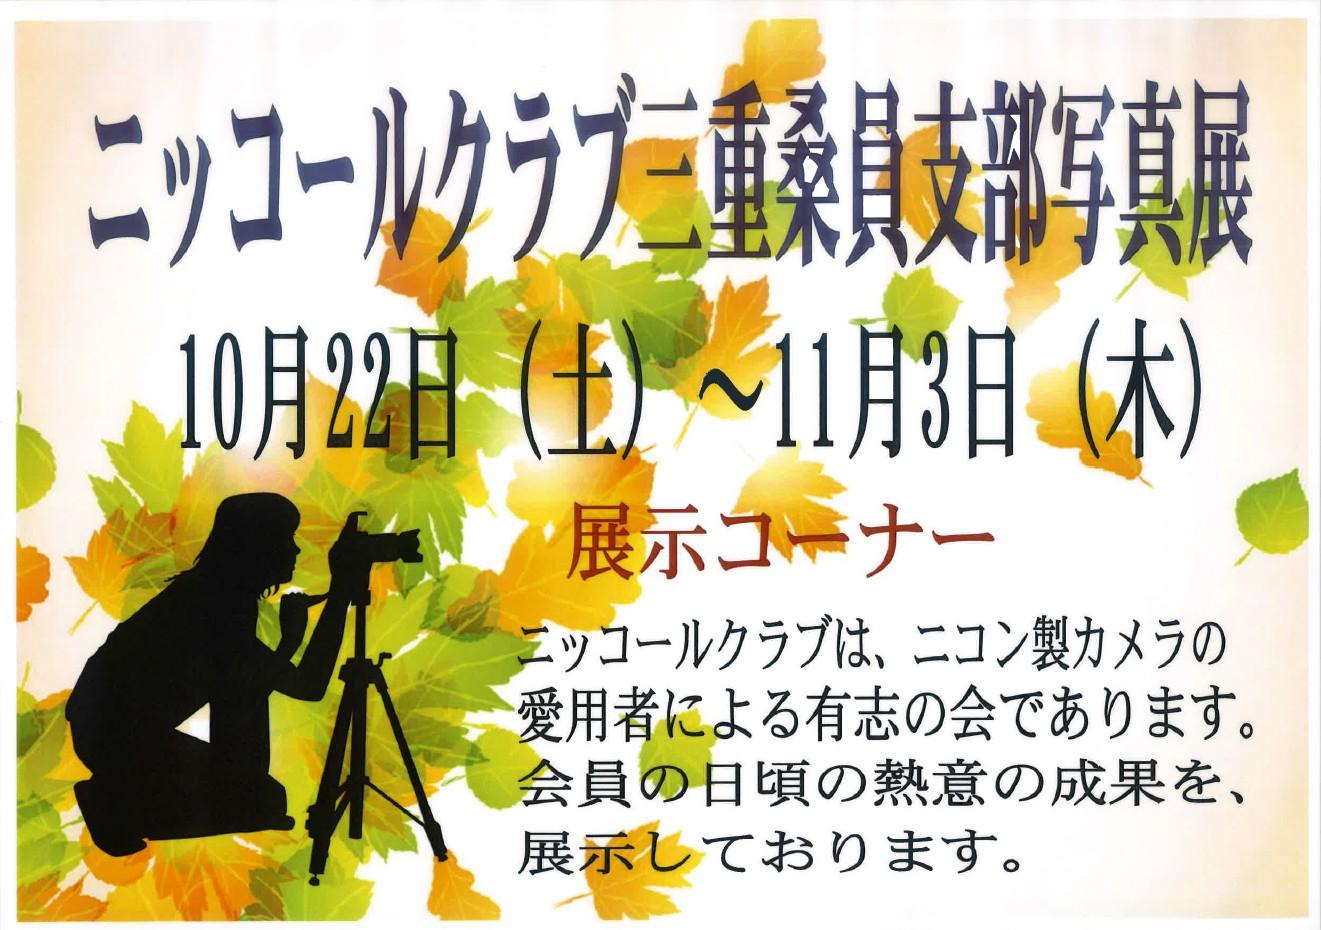 http://www.ajisainosato.com/info/images/2016y10m21d_112928325.jpg